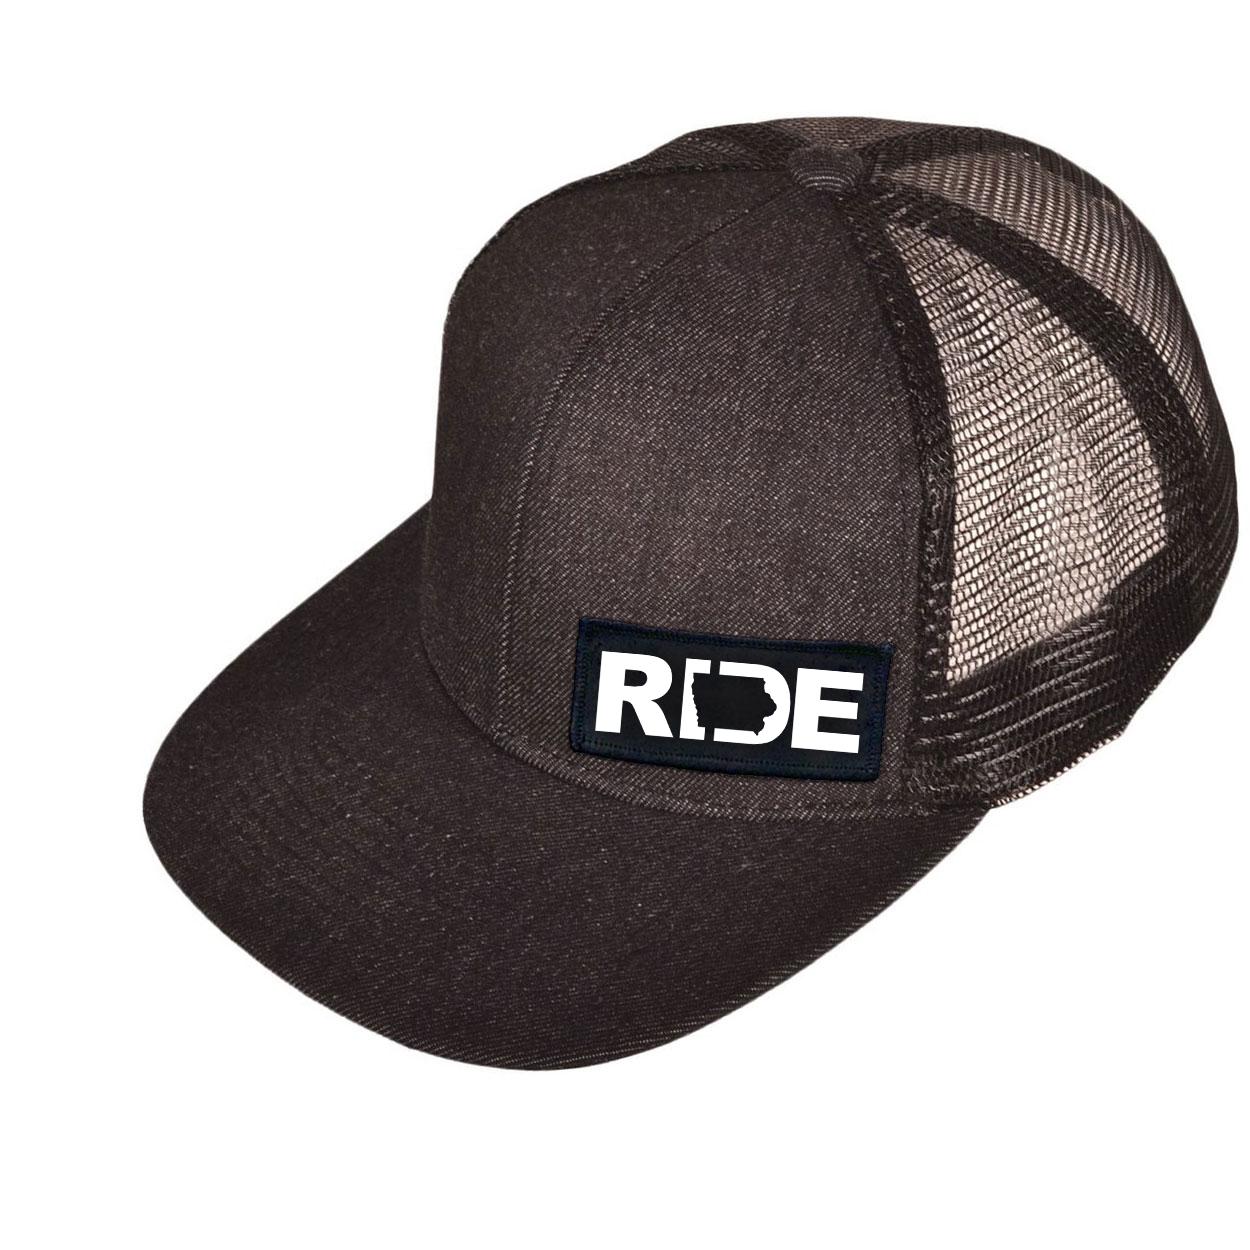 Ride Iowa Night Out Woven Patch Snapback Flat Brim Hat Black Denim (White Logo)